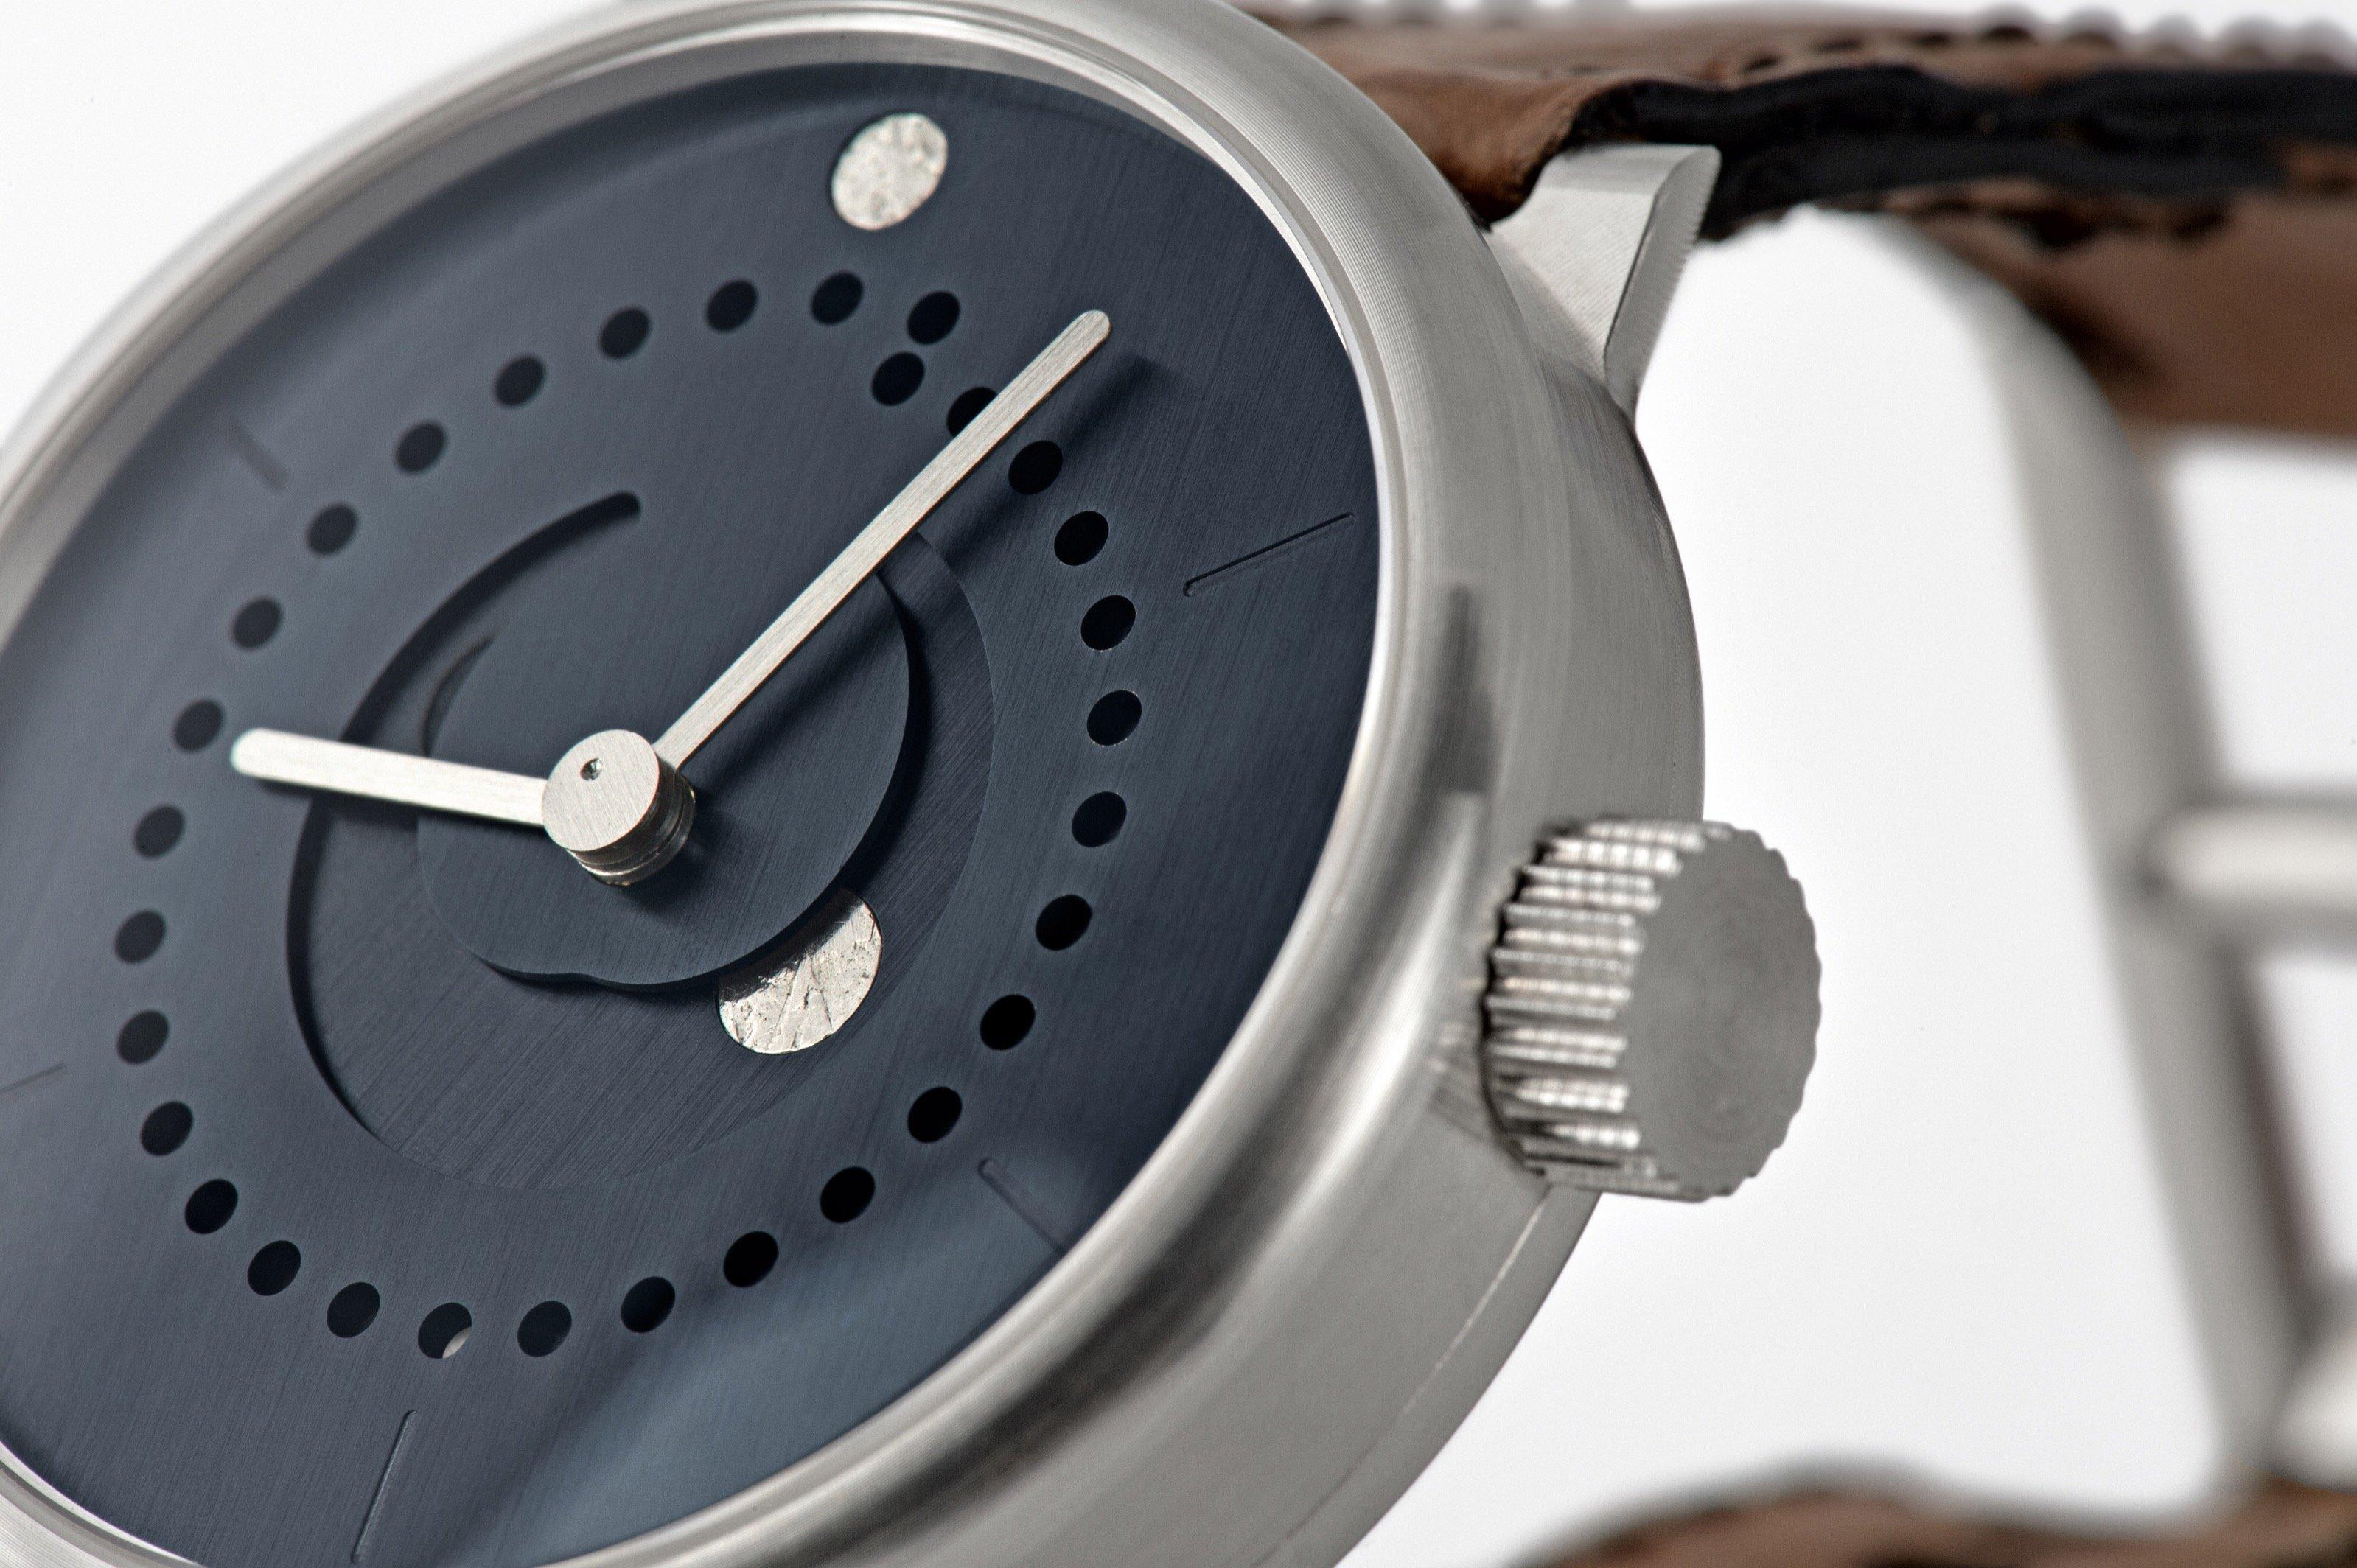 moon-phase-watch-ochs-und-junior-blue-patina-39mm-6-2_RGB-3198px